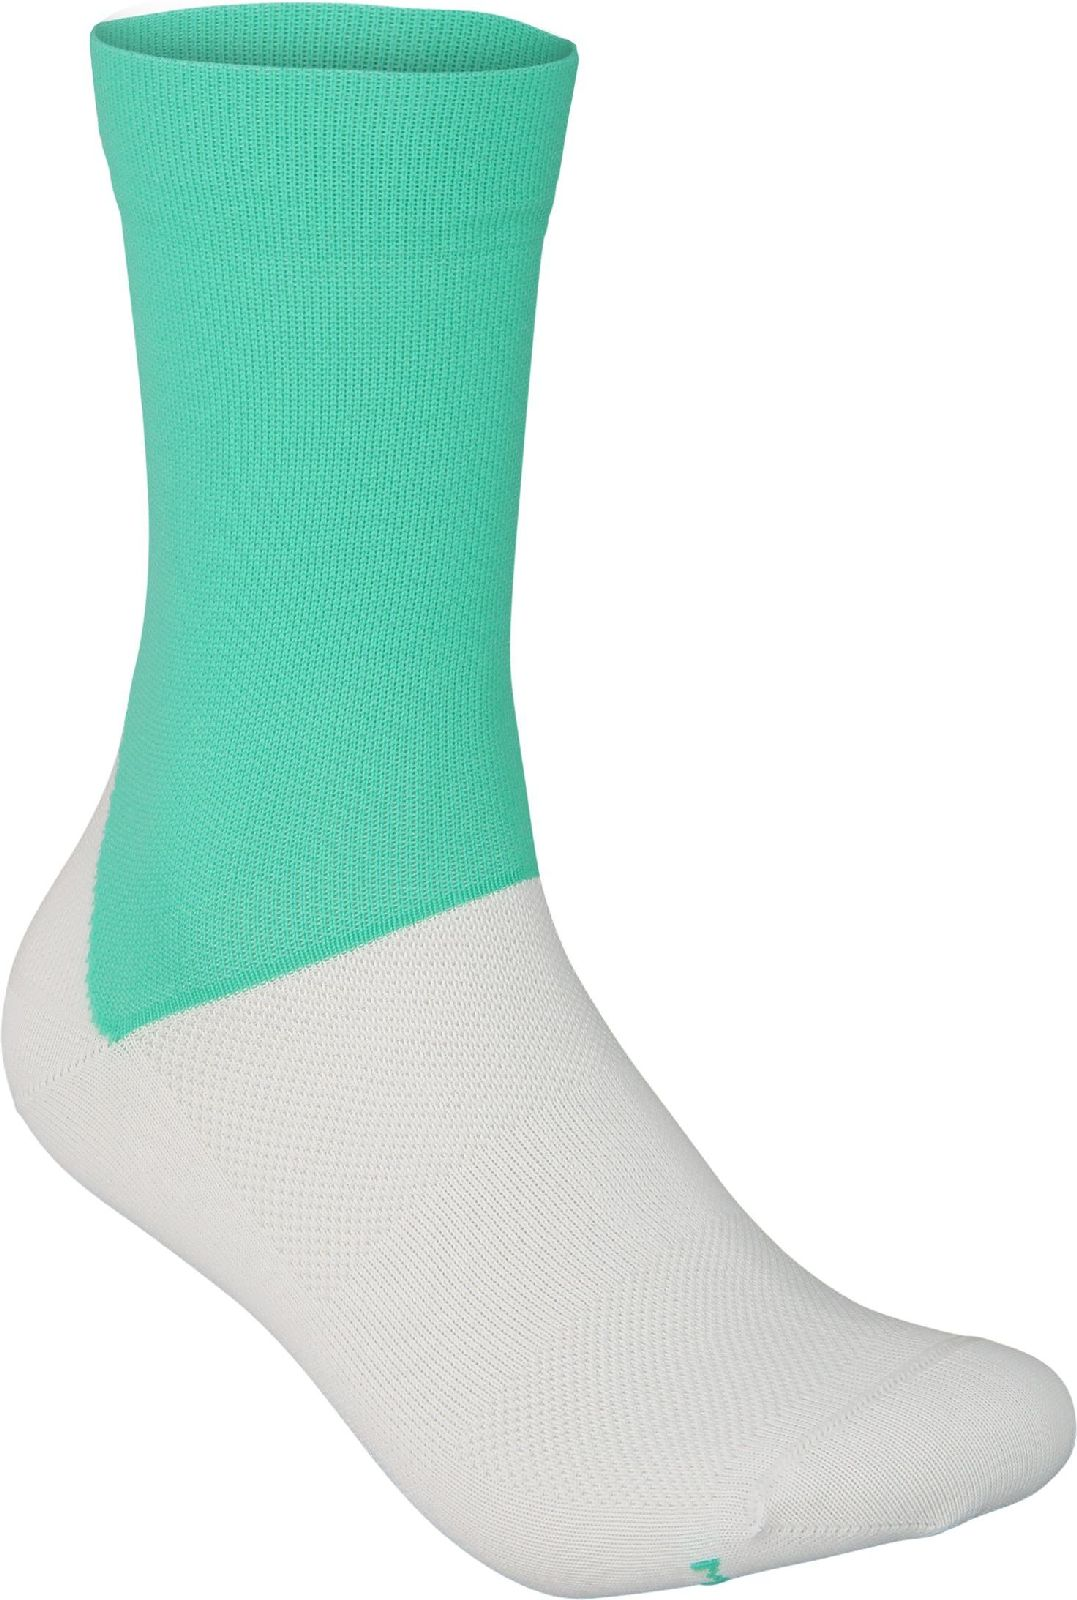 Levně POC Essential Road Sock - Fluorite Green/Hydrogen White 43-45